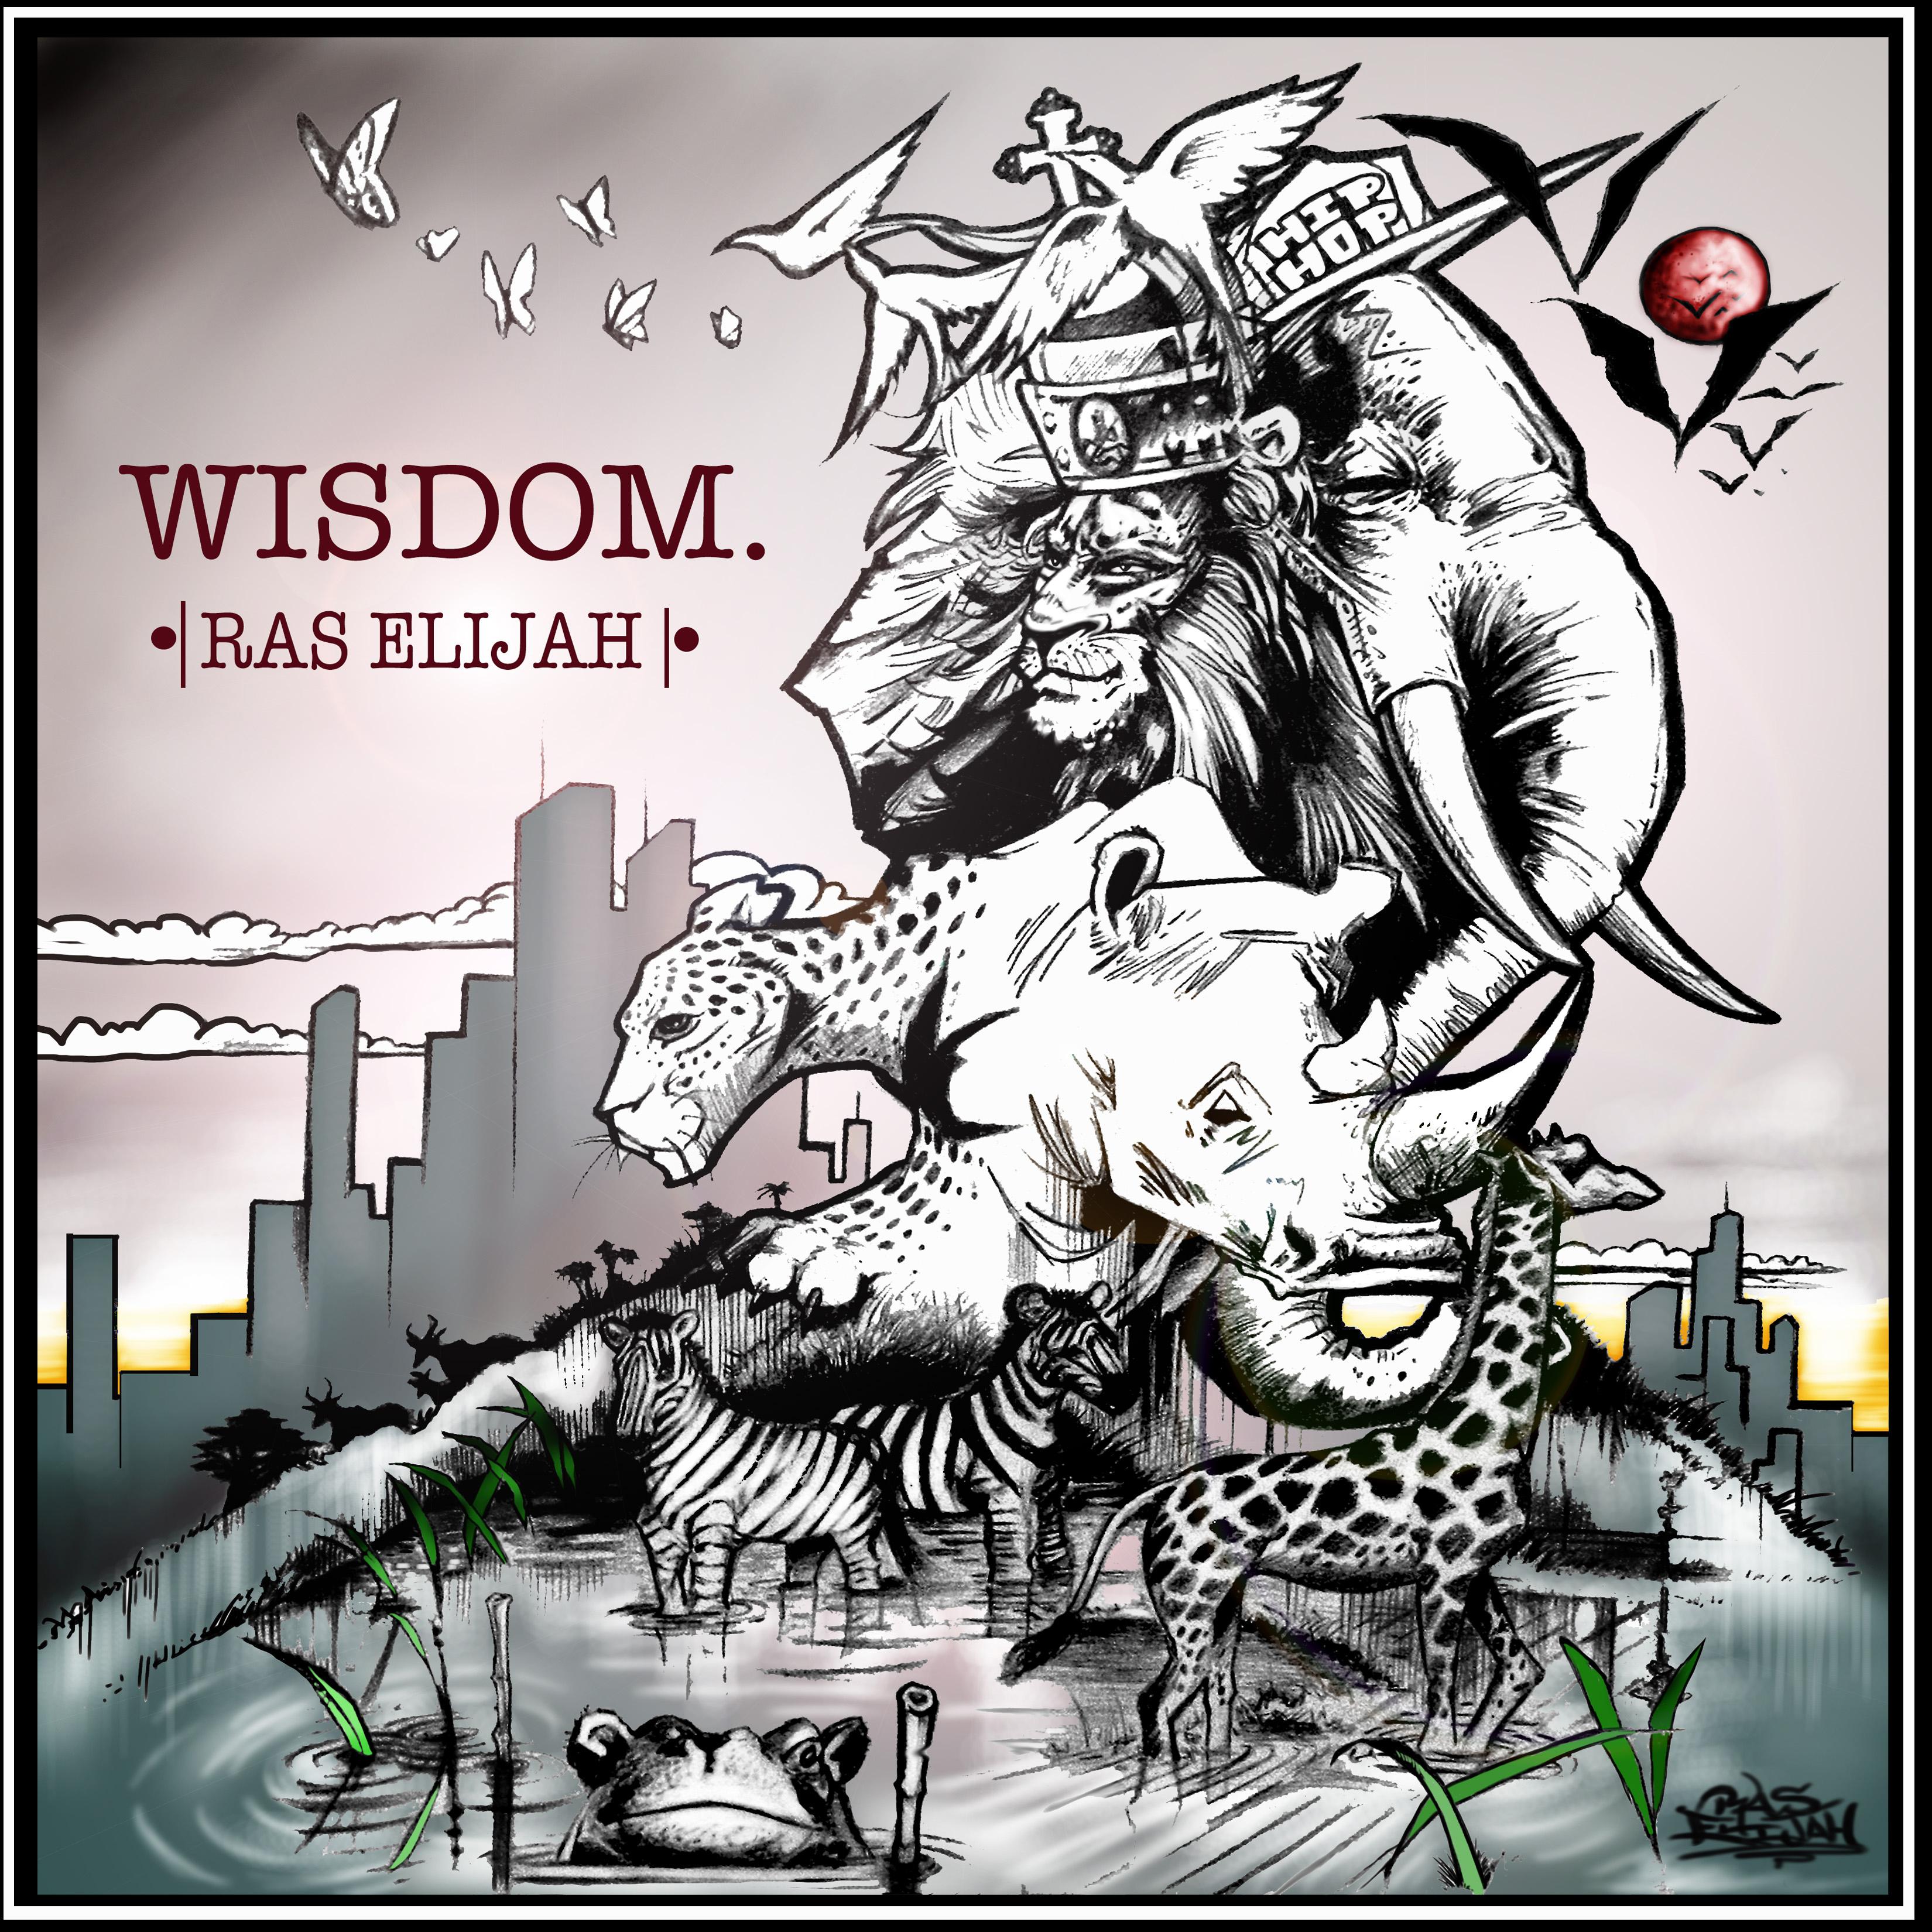 Wisdom Album Cover Ras Elijah Tafari